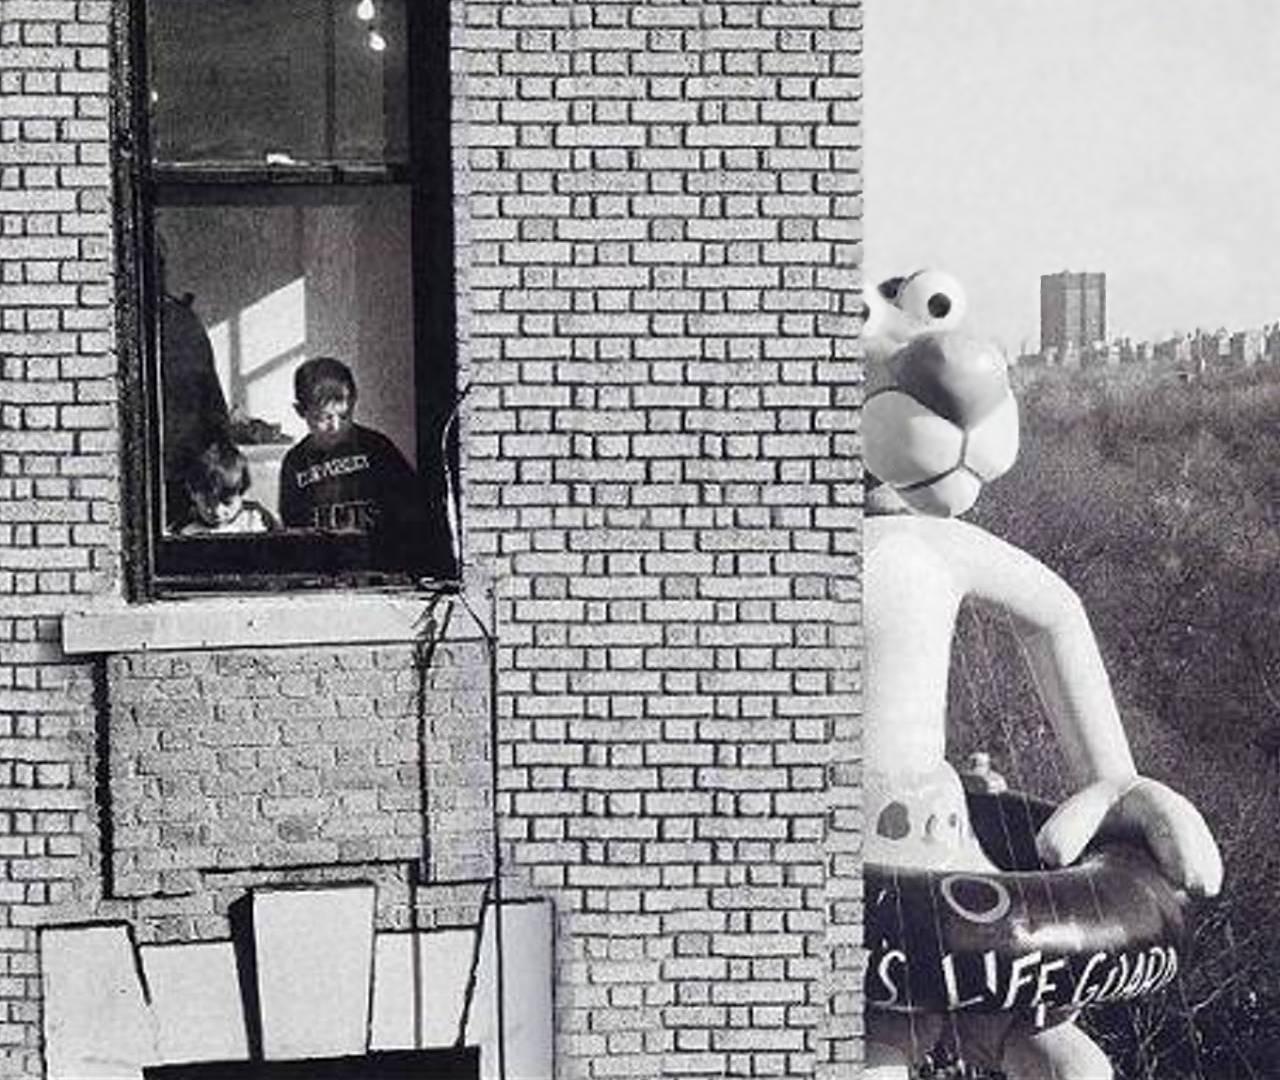 1964-macys-parade-pink-panther-bw.jpg